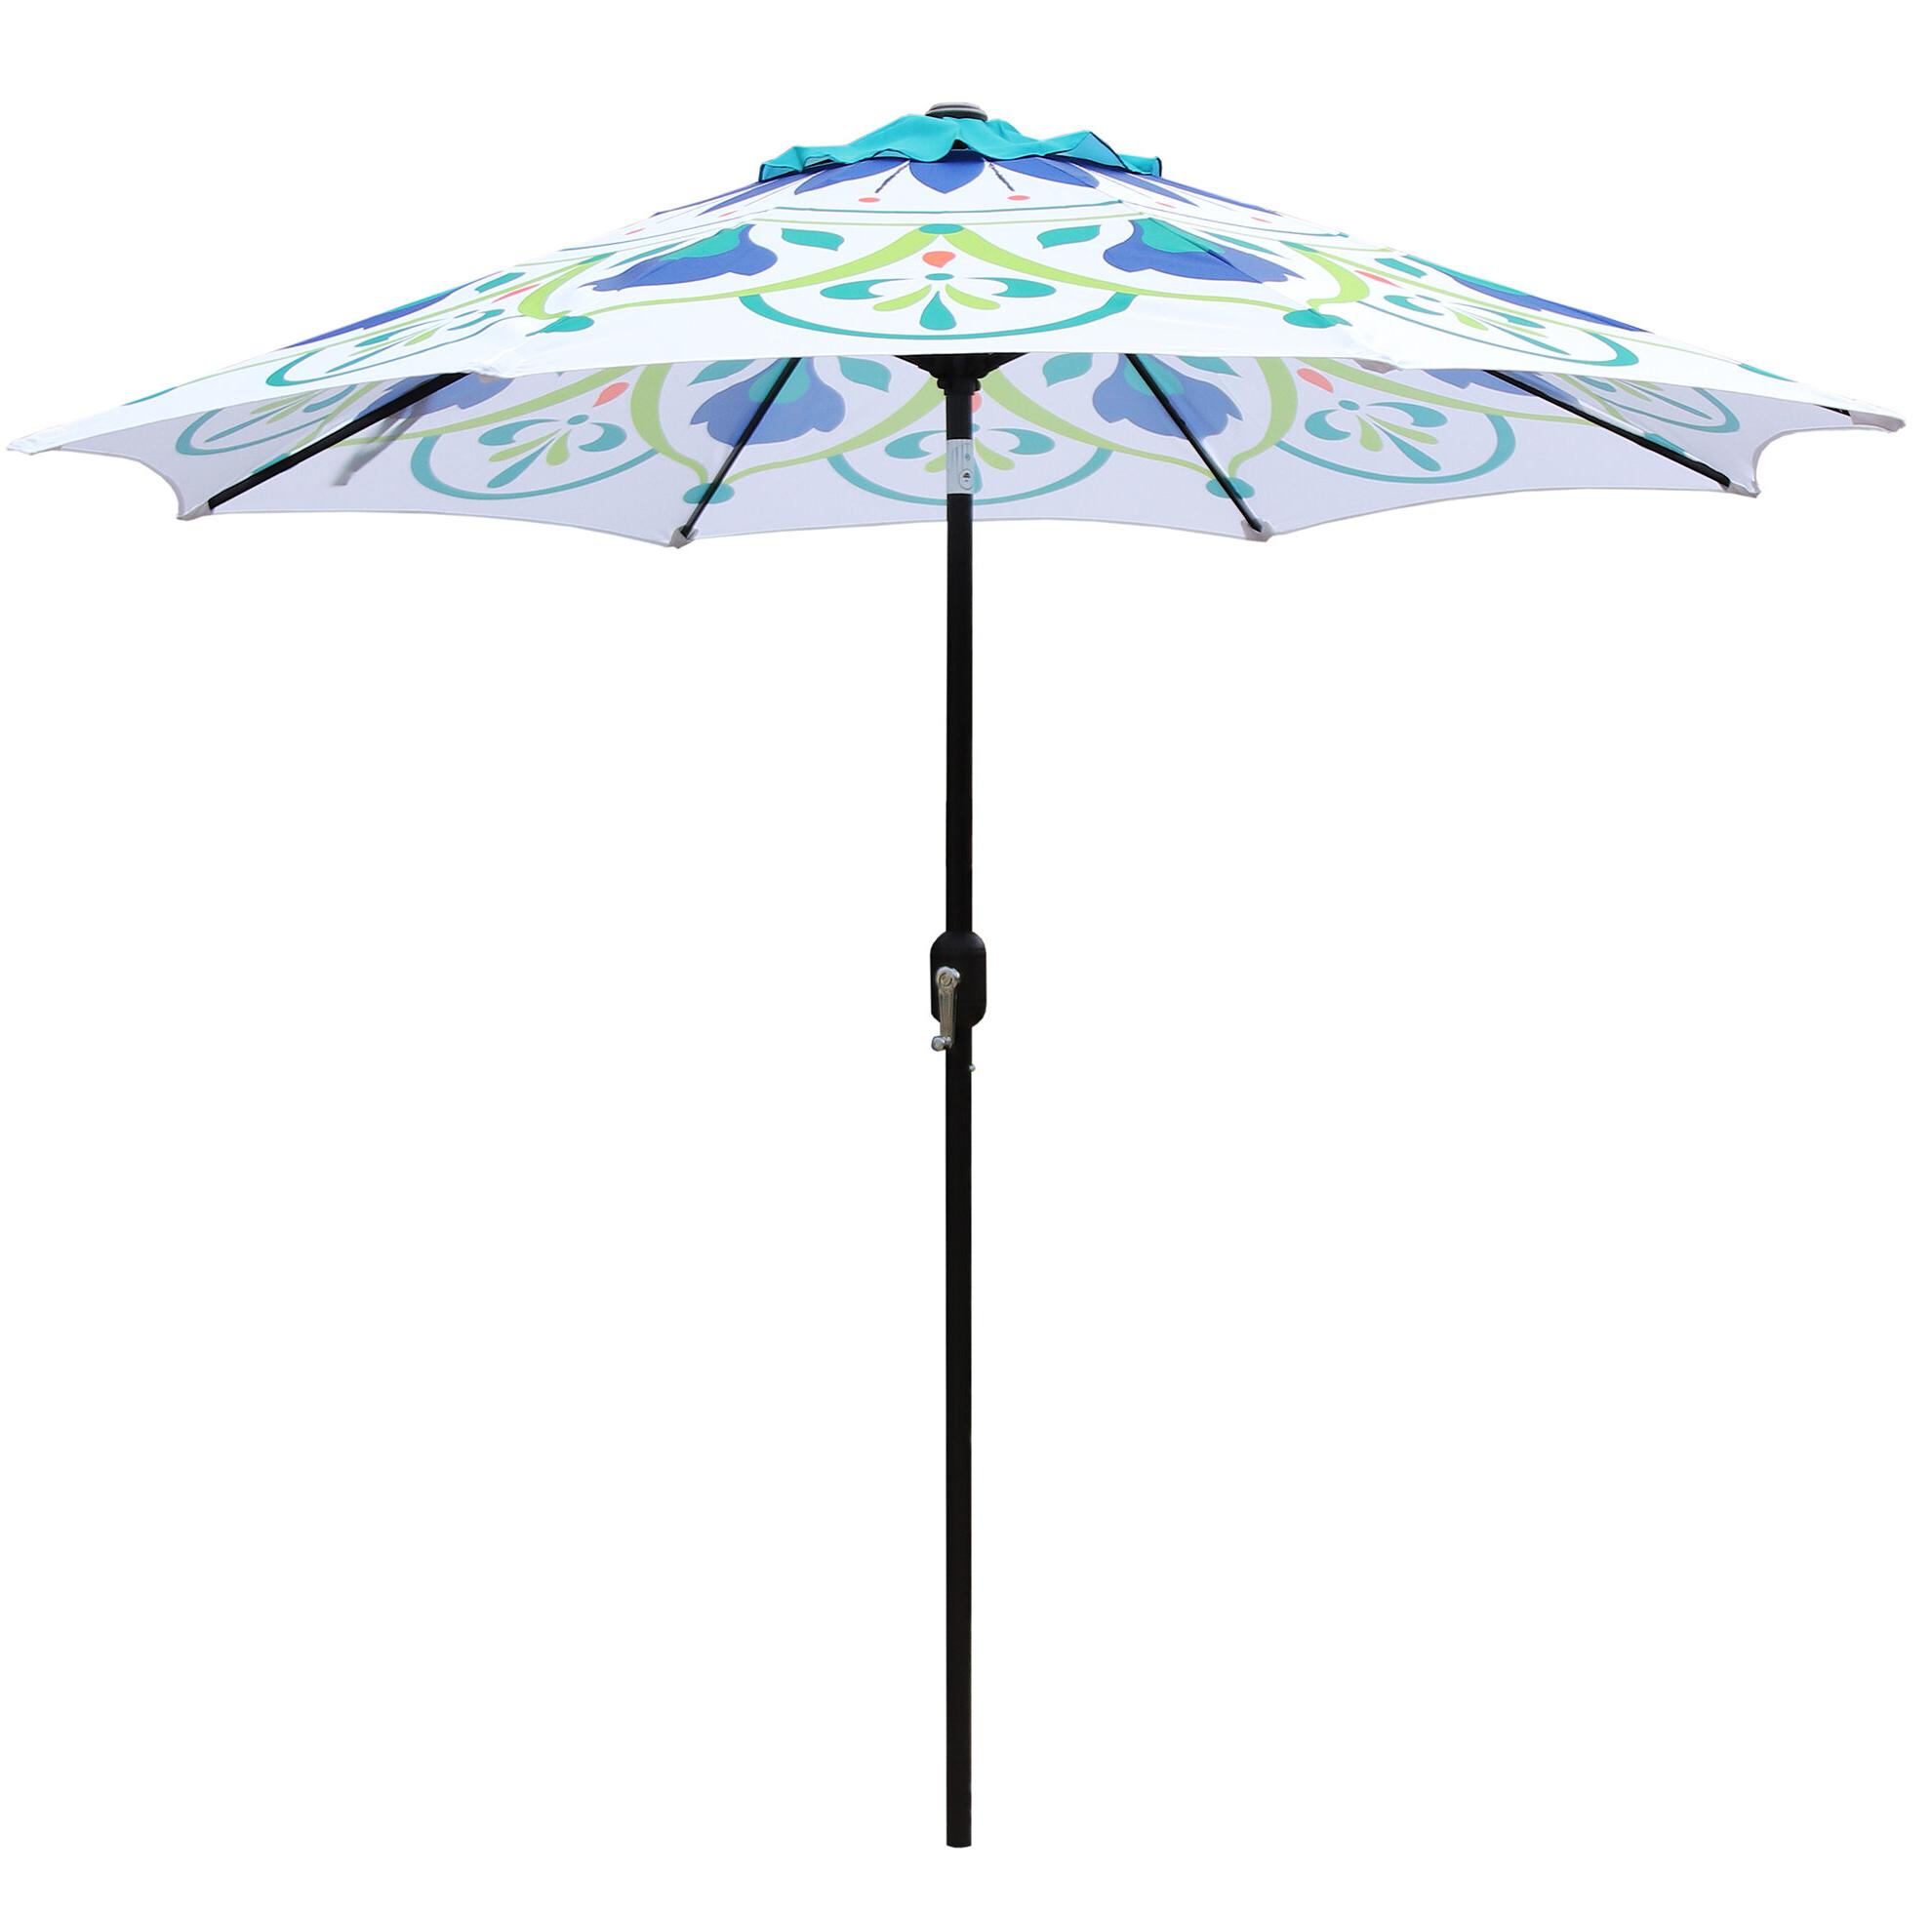 Sittard 9' Market Umbrella For Popular Filey Market Umbrellas (View 3 of 20)